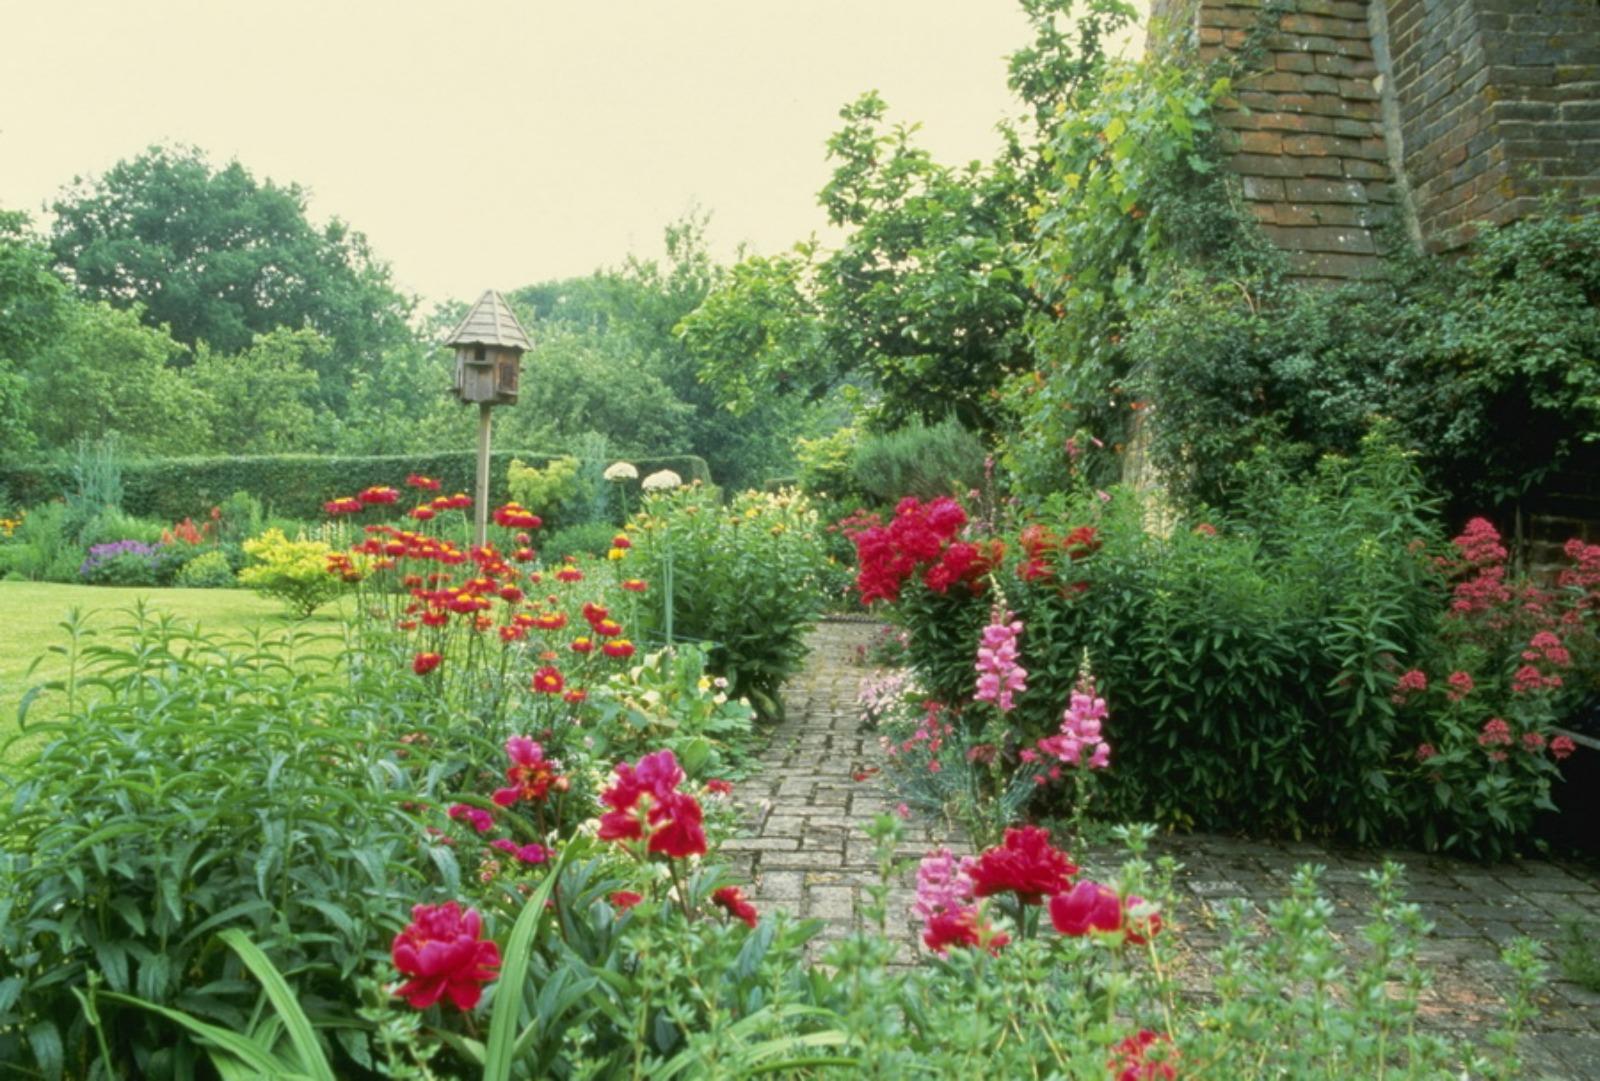 Country gardens wallpaper - English Garden Wallpaper Forwallpaper Com